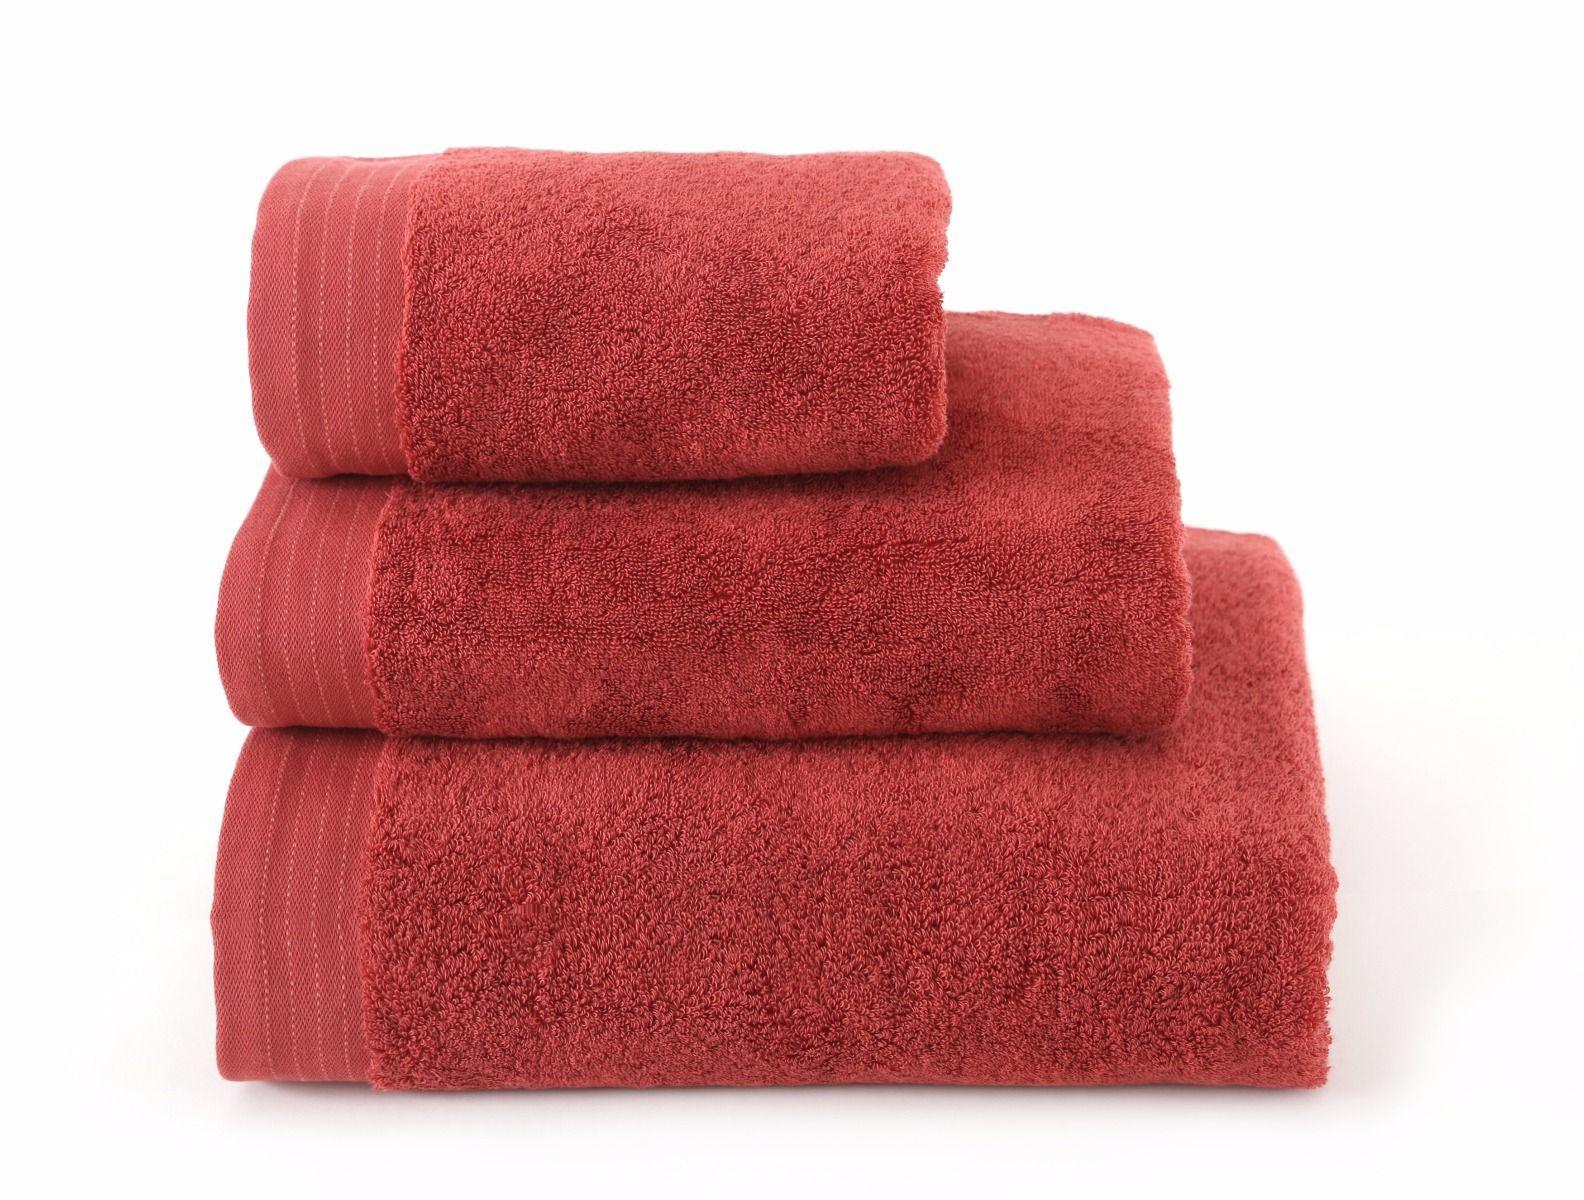 Badezimmer Handtücher ~ Die besten beste badetücher ideen auf handtücher